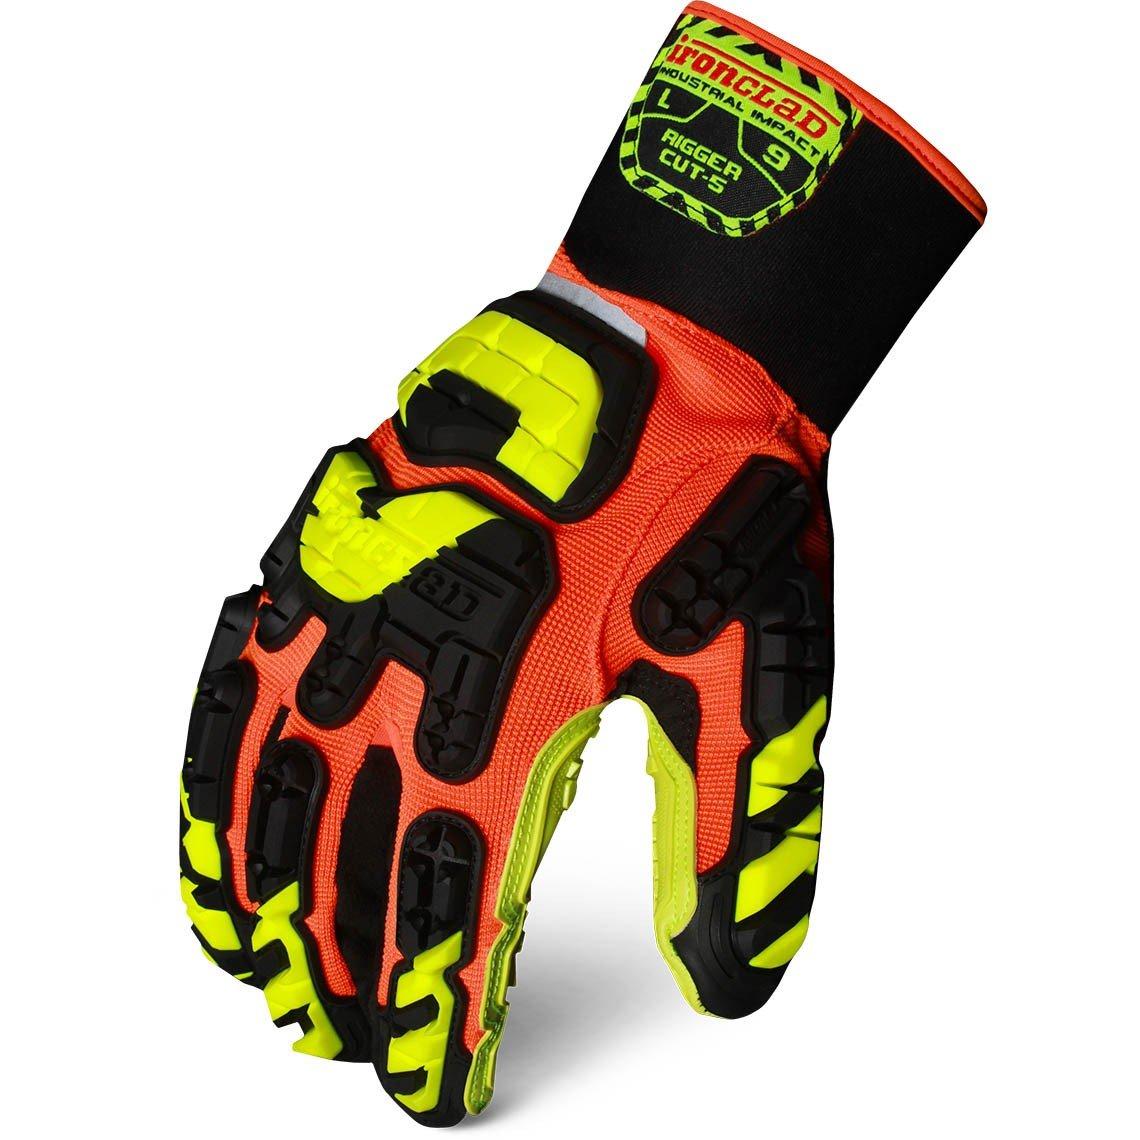 IRONCLAD Vibram Rigger Cut-5 Impact Protection Glove IRON-VIB-RIGC5 (Extra Large)